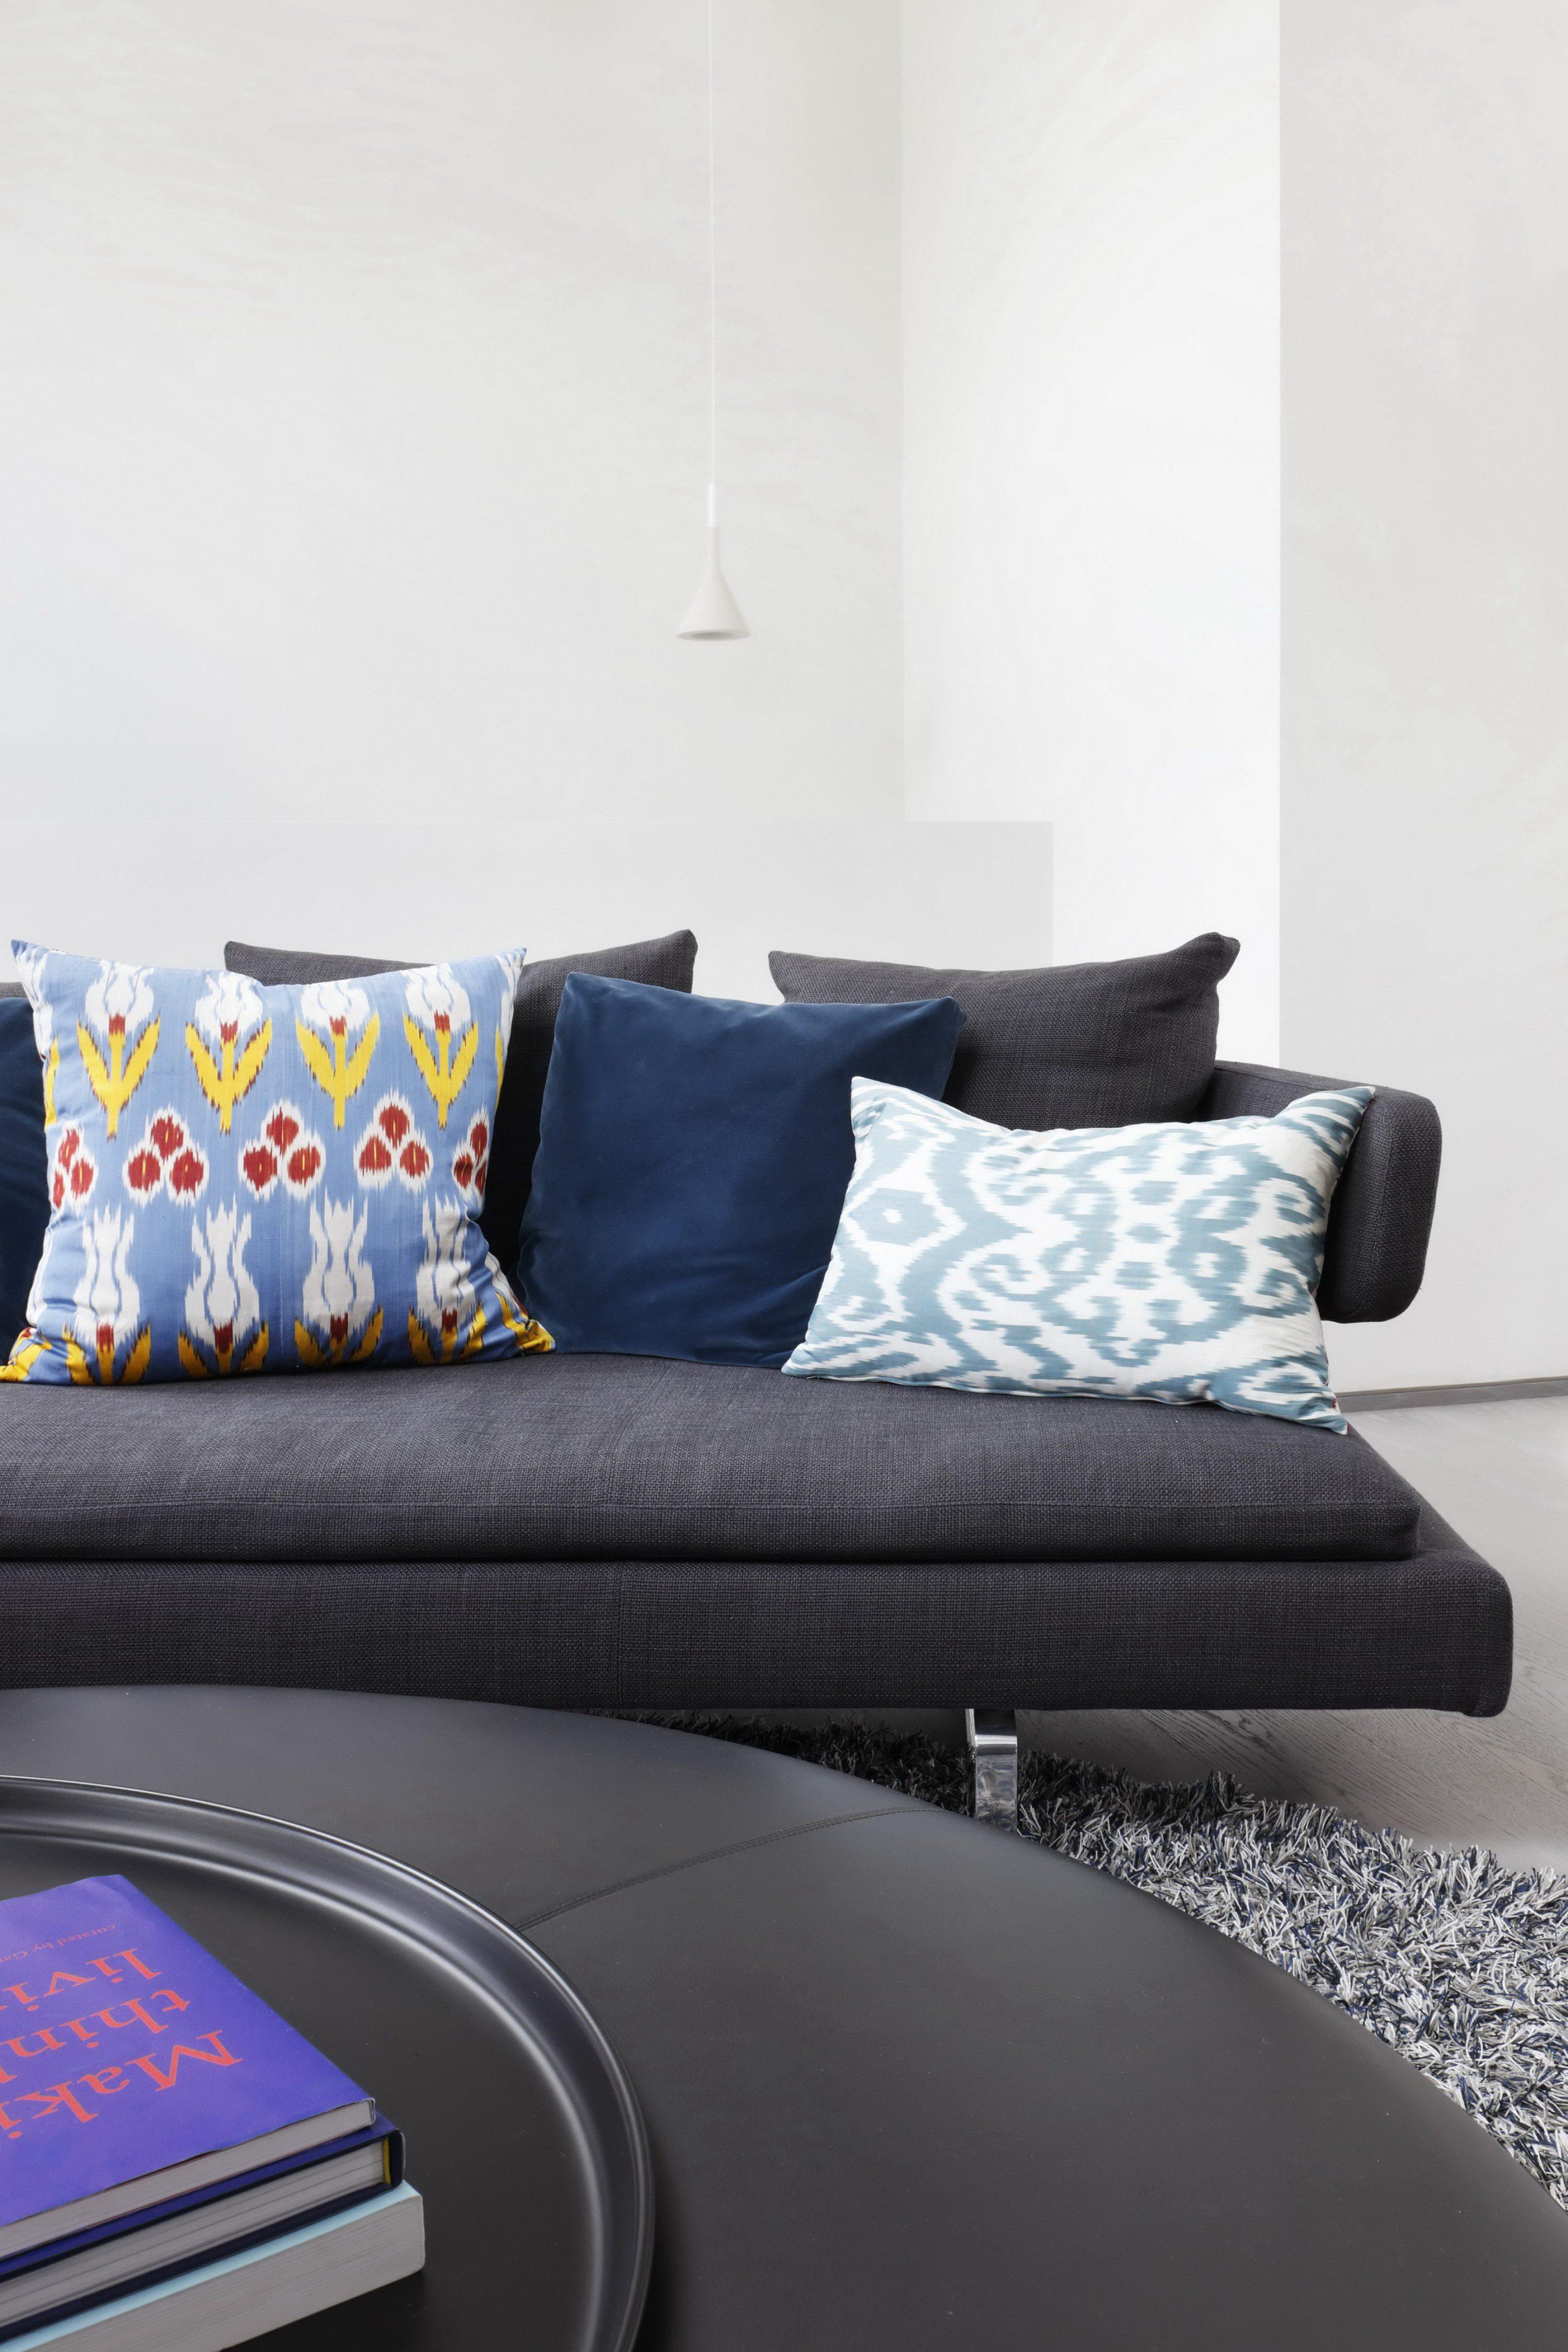 Maida Vale Soft Apartment by MWAI